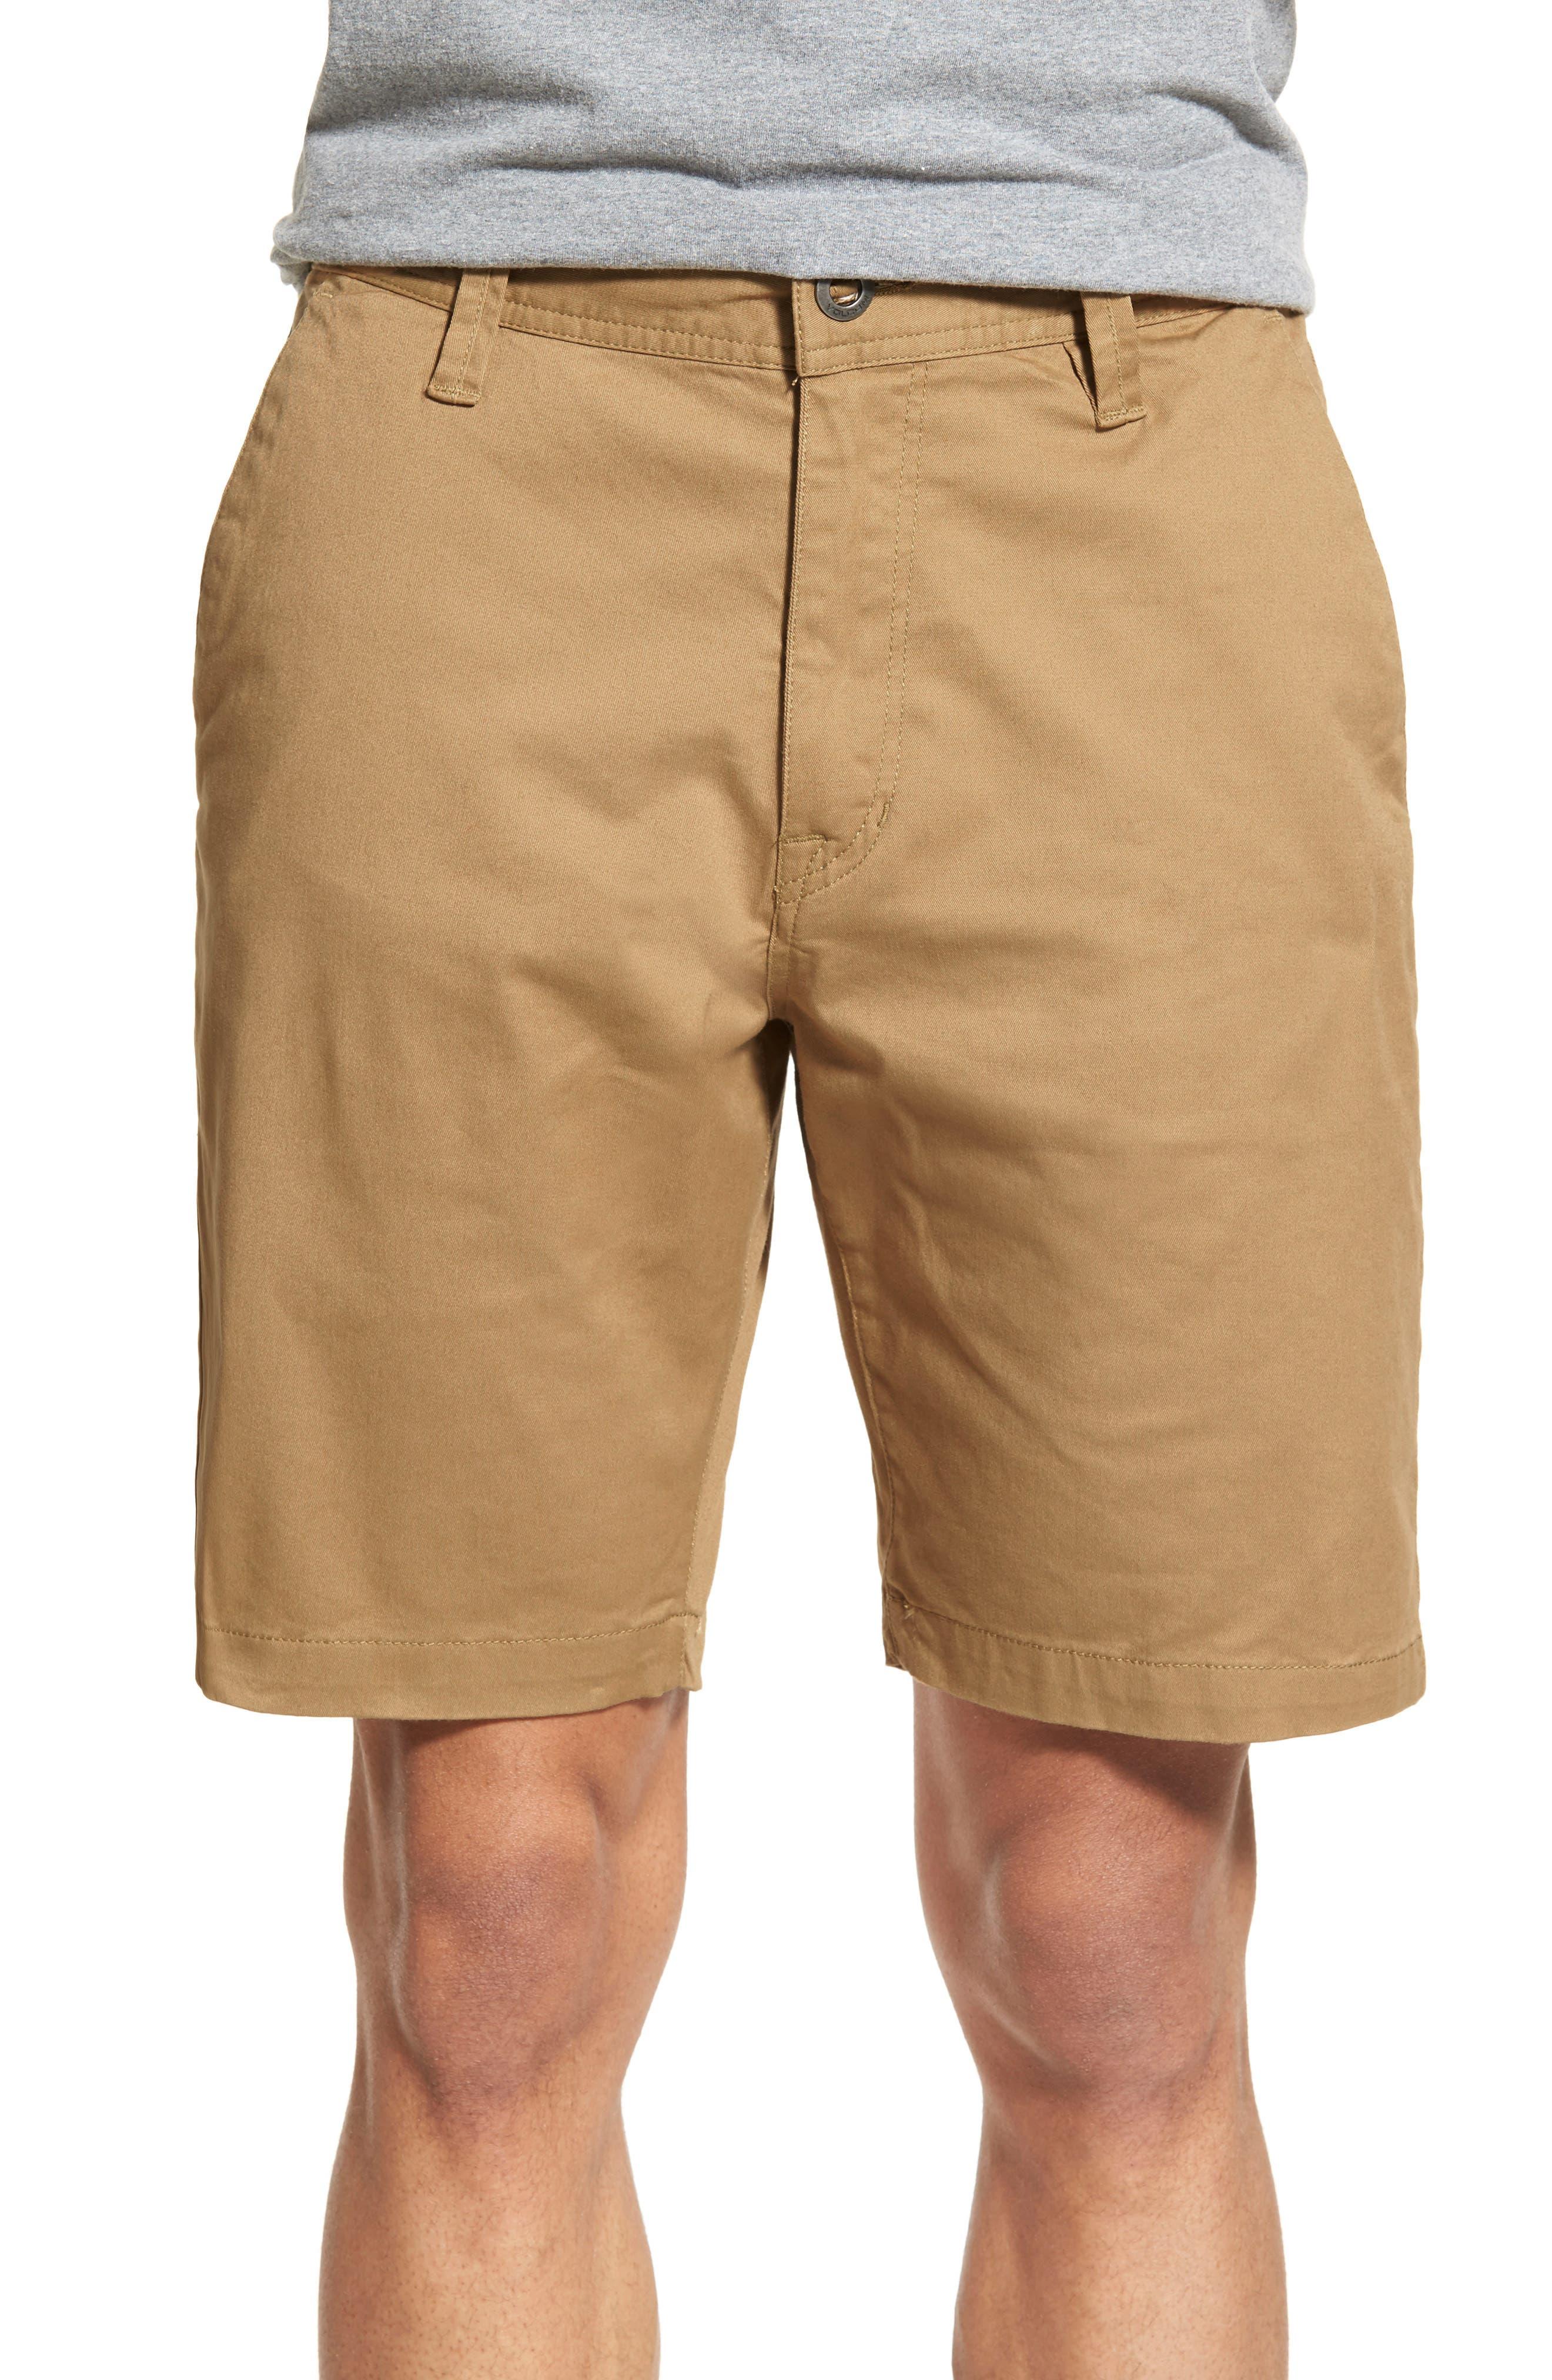 Alternate Image 1 Selected - Volcom Lightweight Shorts